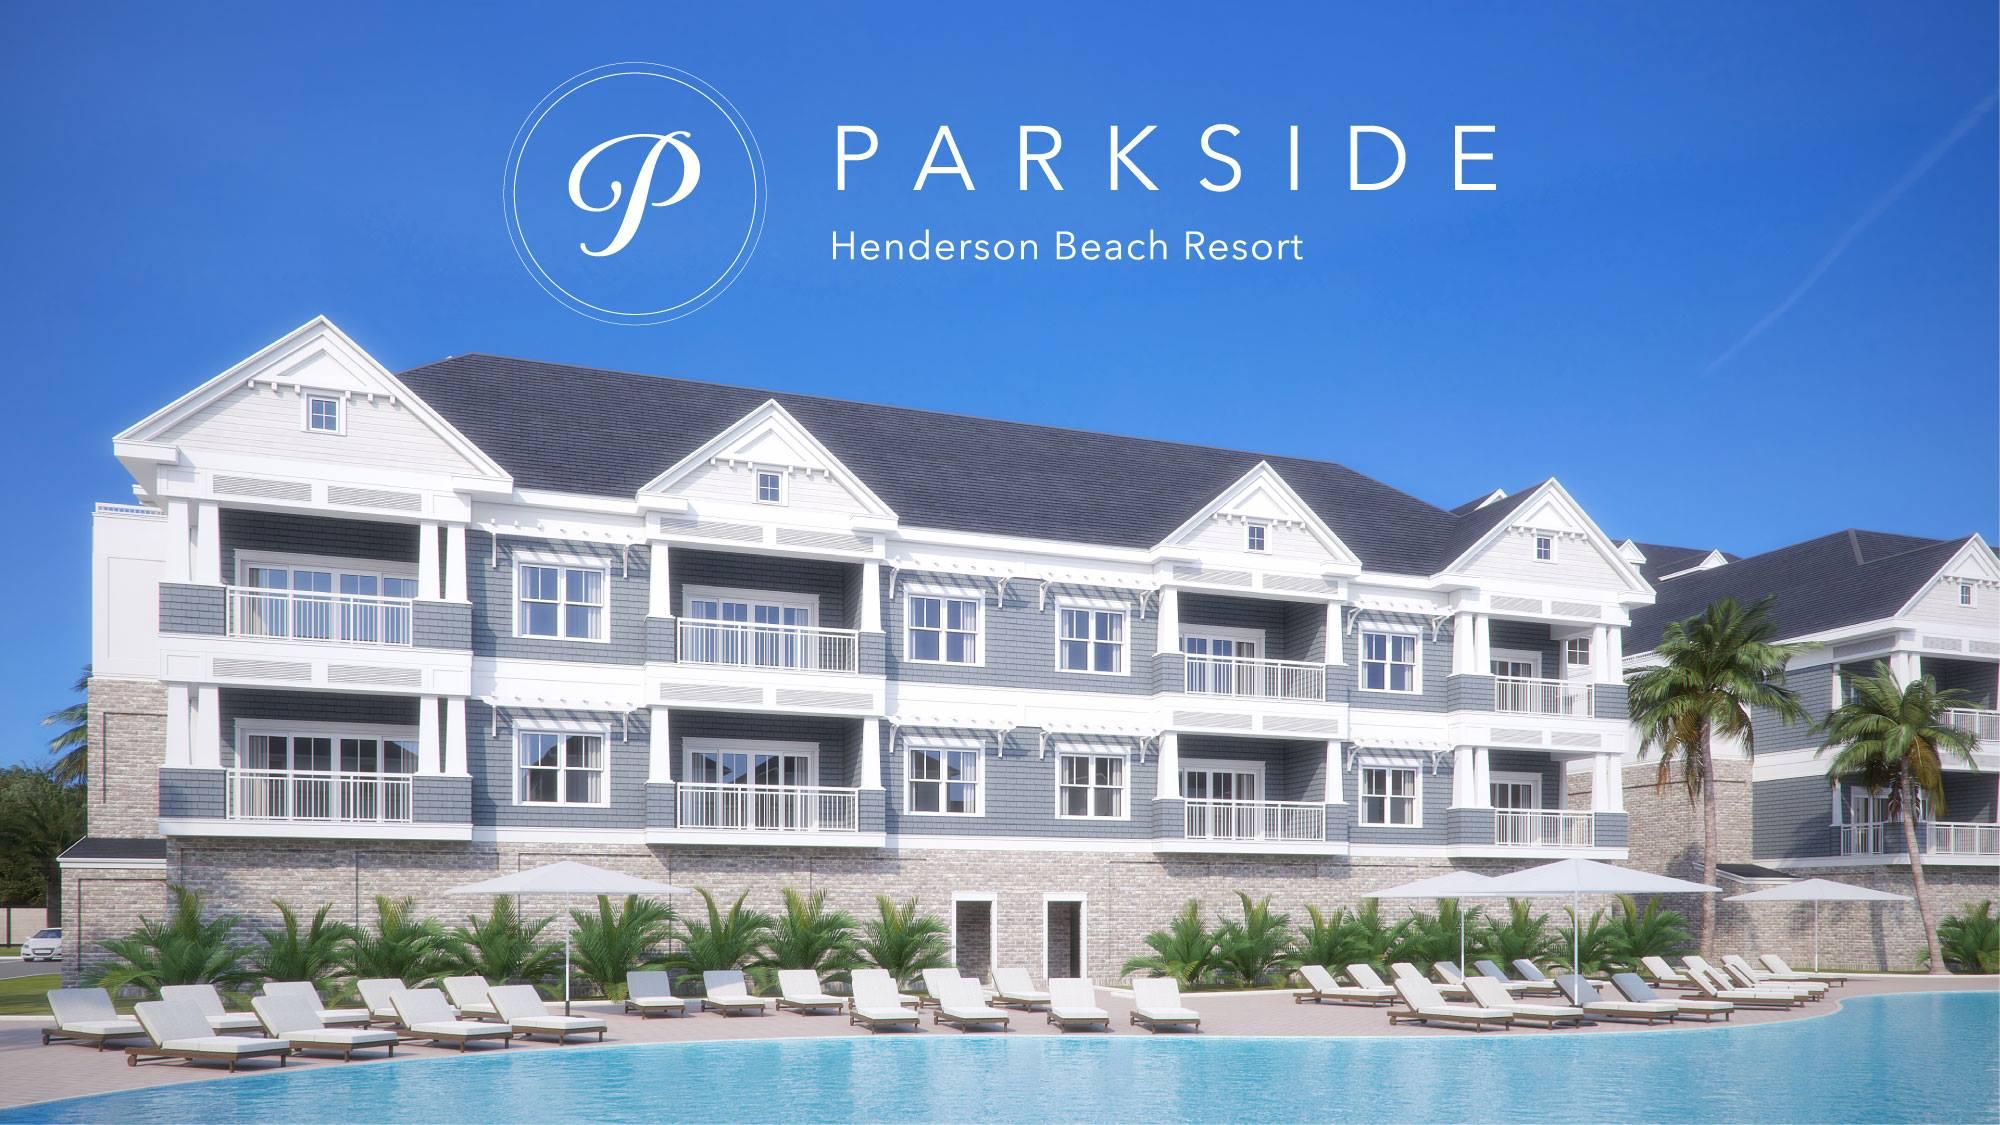 PARKSIDE-HENDERSON-BEACH-RESORT-PRESCOTT-ARCHITECTS-DESTIN-FLORIDA-EFFORTLESS-RESORT-LIVING-JEFFREY-PRESCOTT-COMMERCIAL-ARCHITECTURE-4.jpg